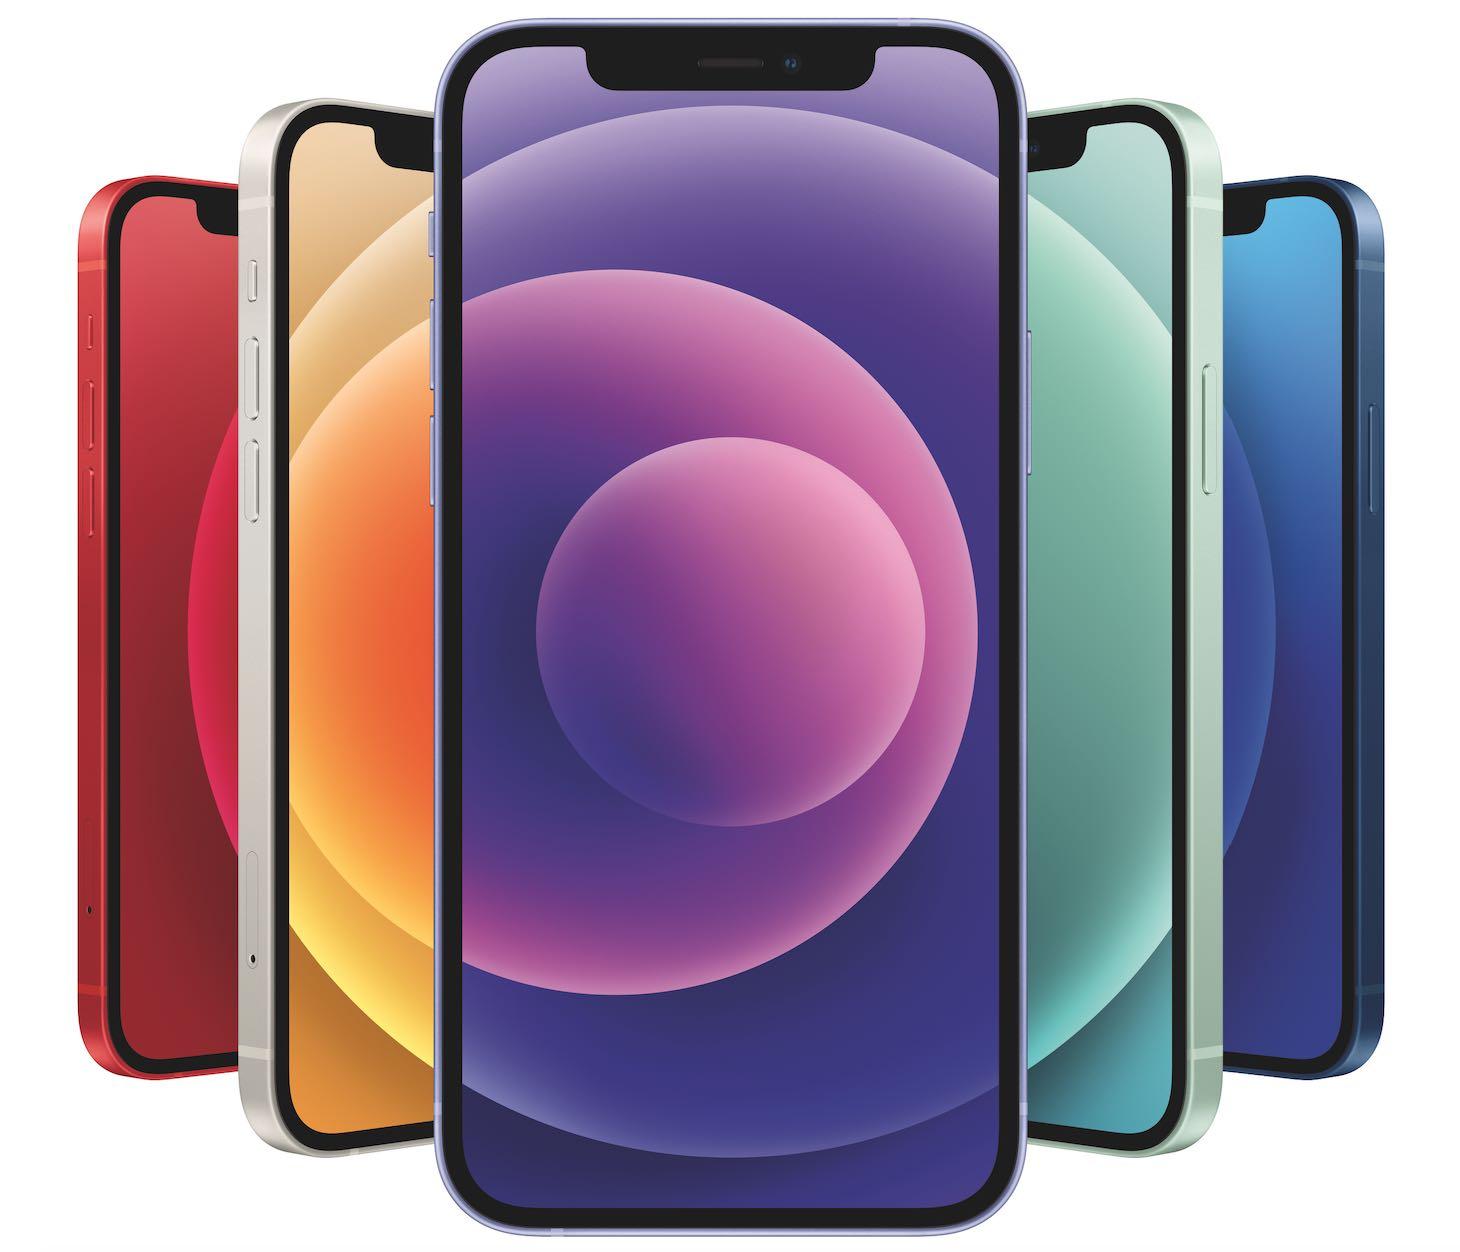 Trendy Look! iPhone 12 Warna Ungu Segera Rilis di Indonesia